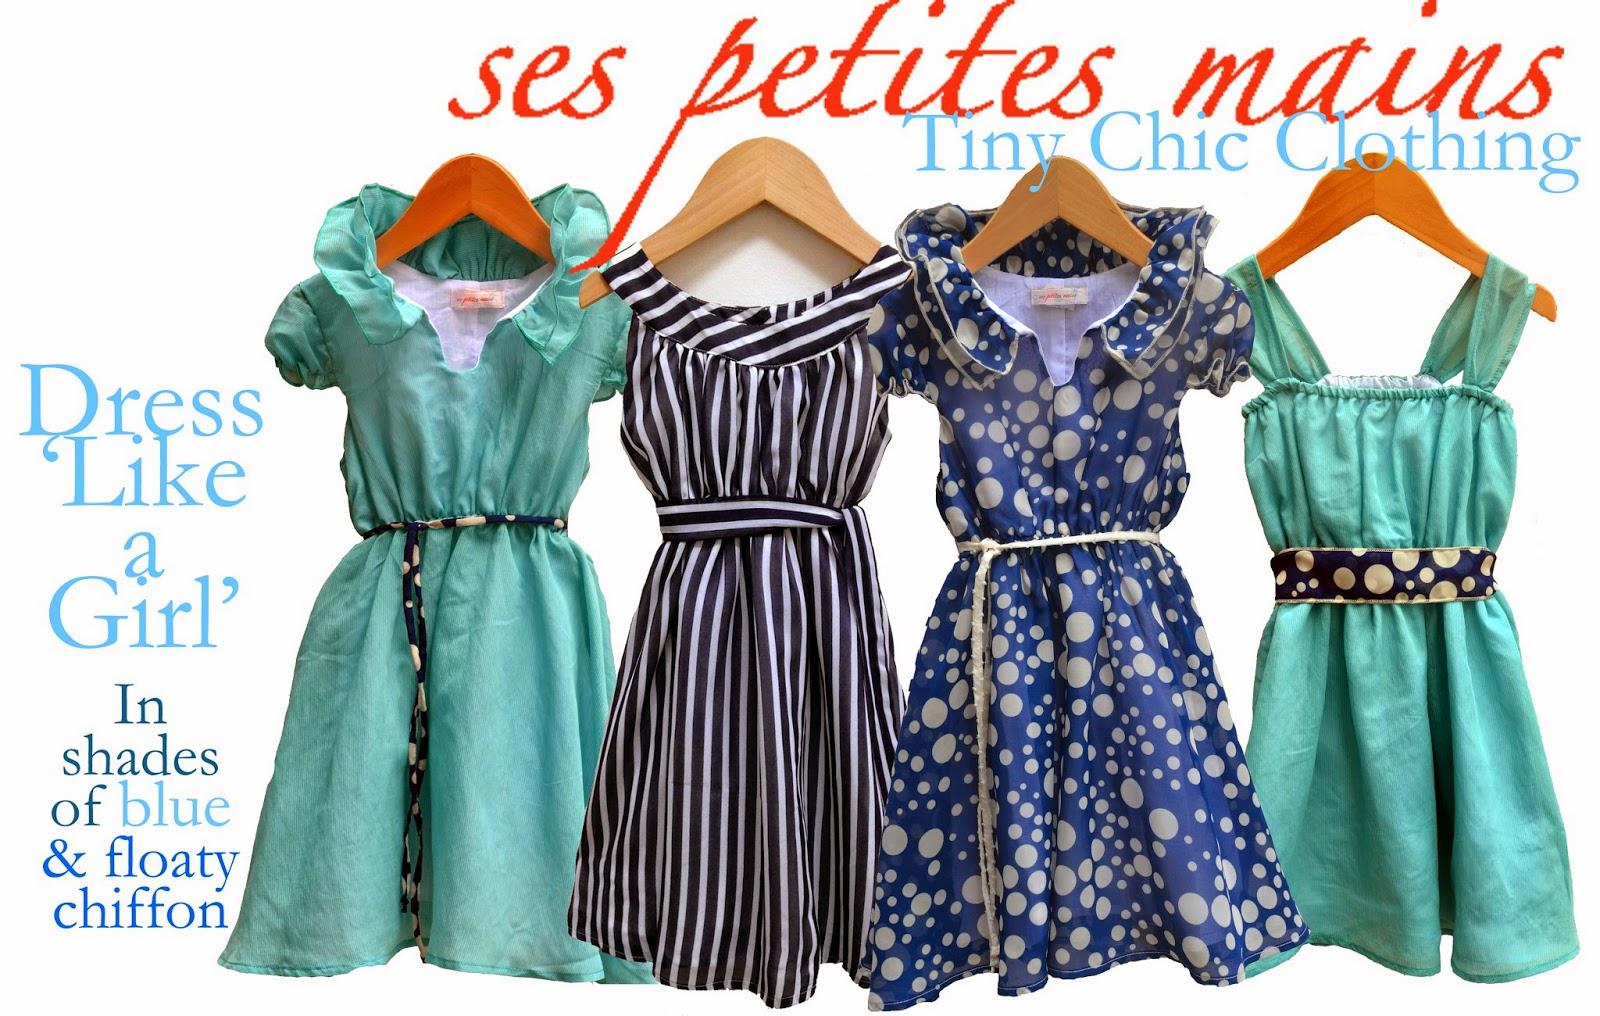 Special occasion dresses   tween dresses   girls dresses   flower girl dresses   back to school dresses   junior bridesmaid dresses   Martha Stewart Wedding